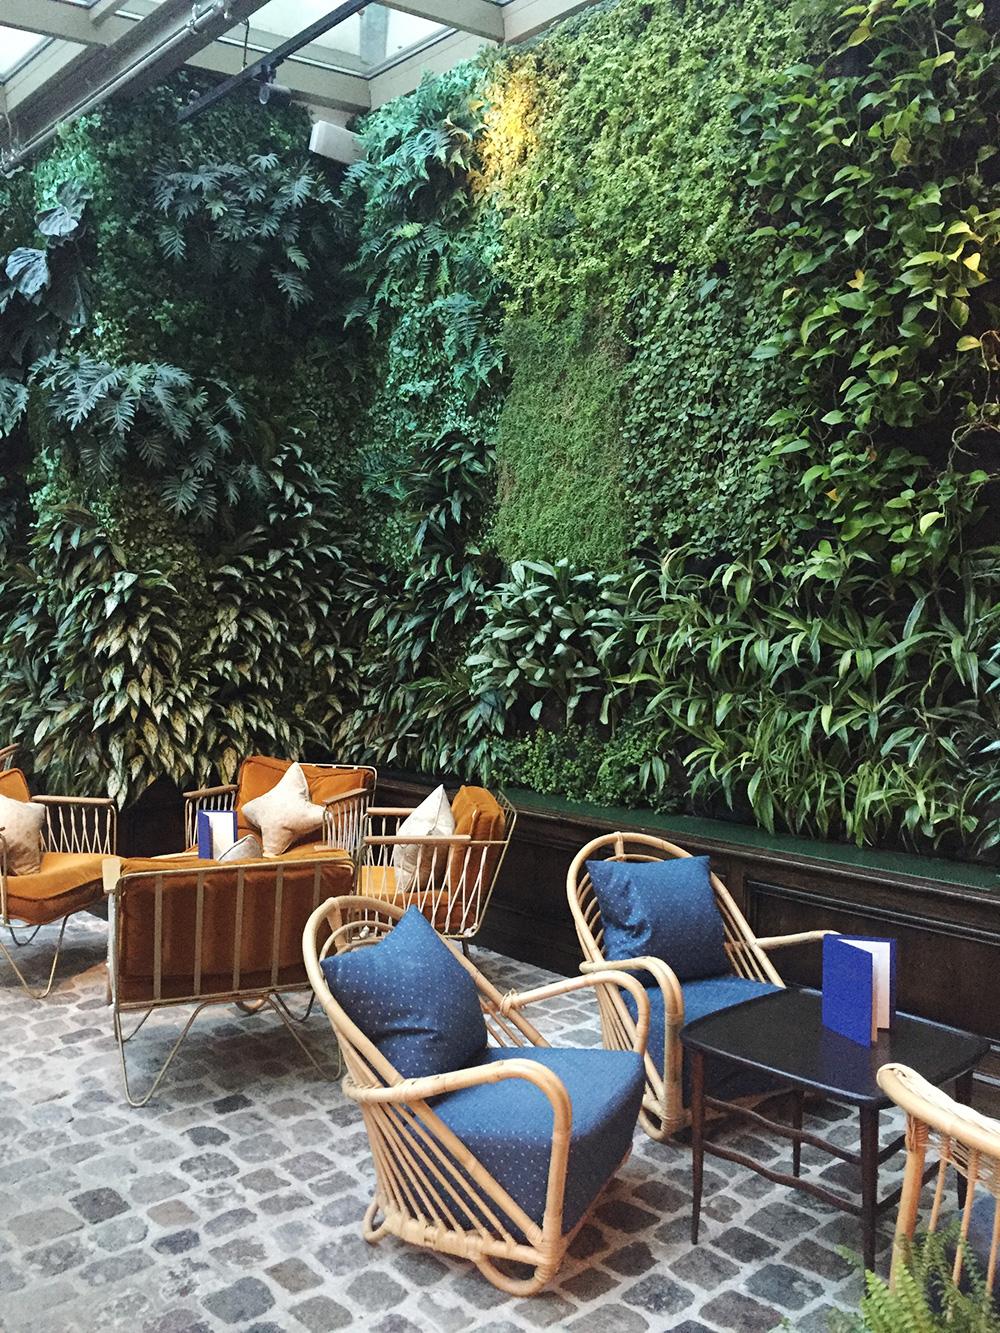 RosyCheeks-Blog-The-Hoxton-Hotel-Paris-plants